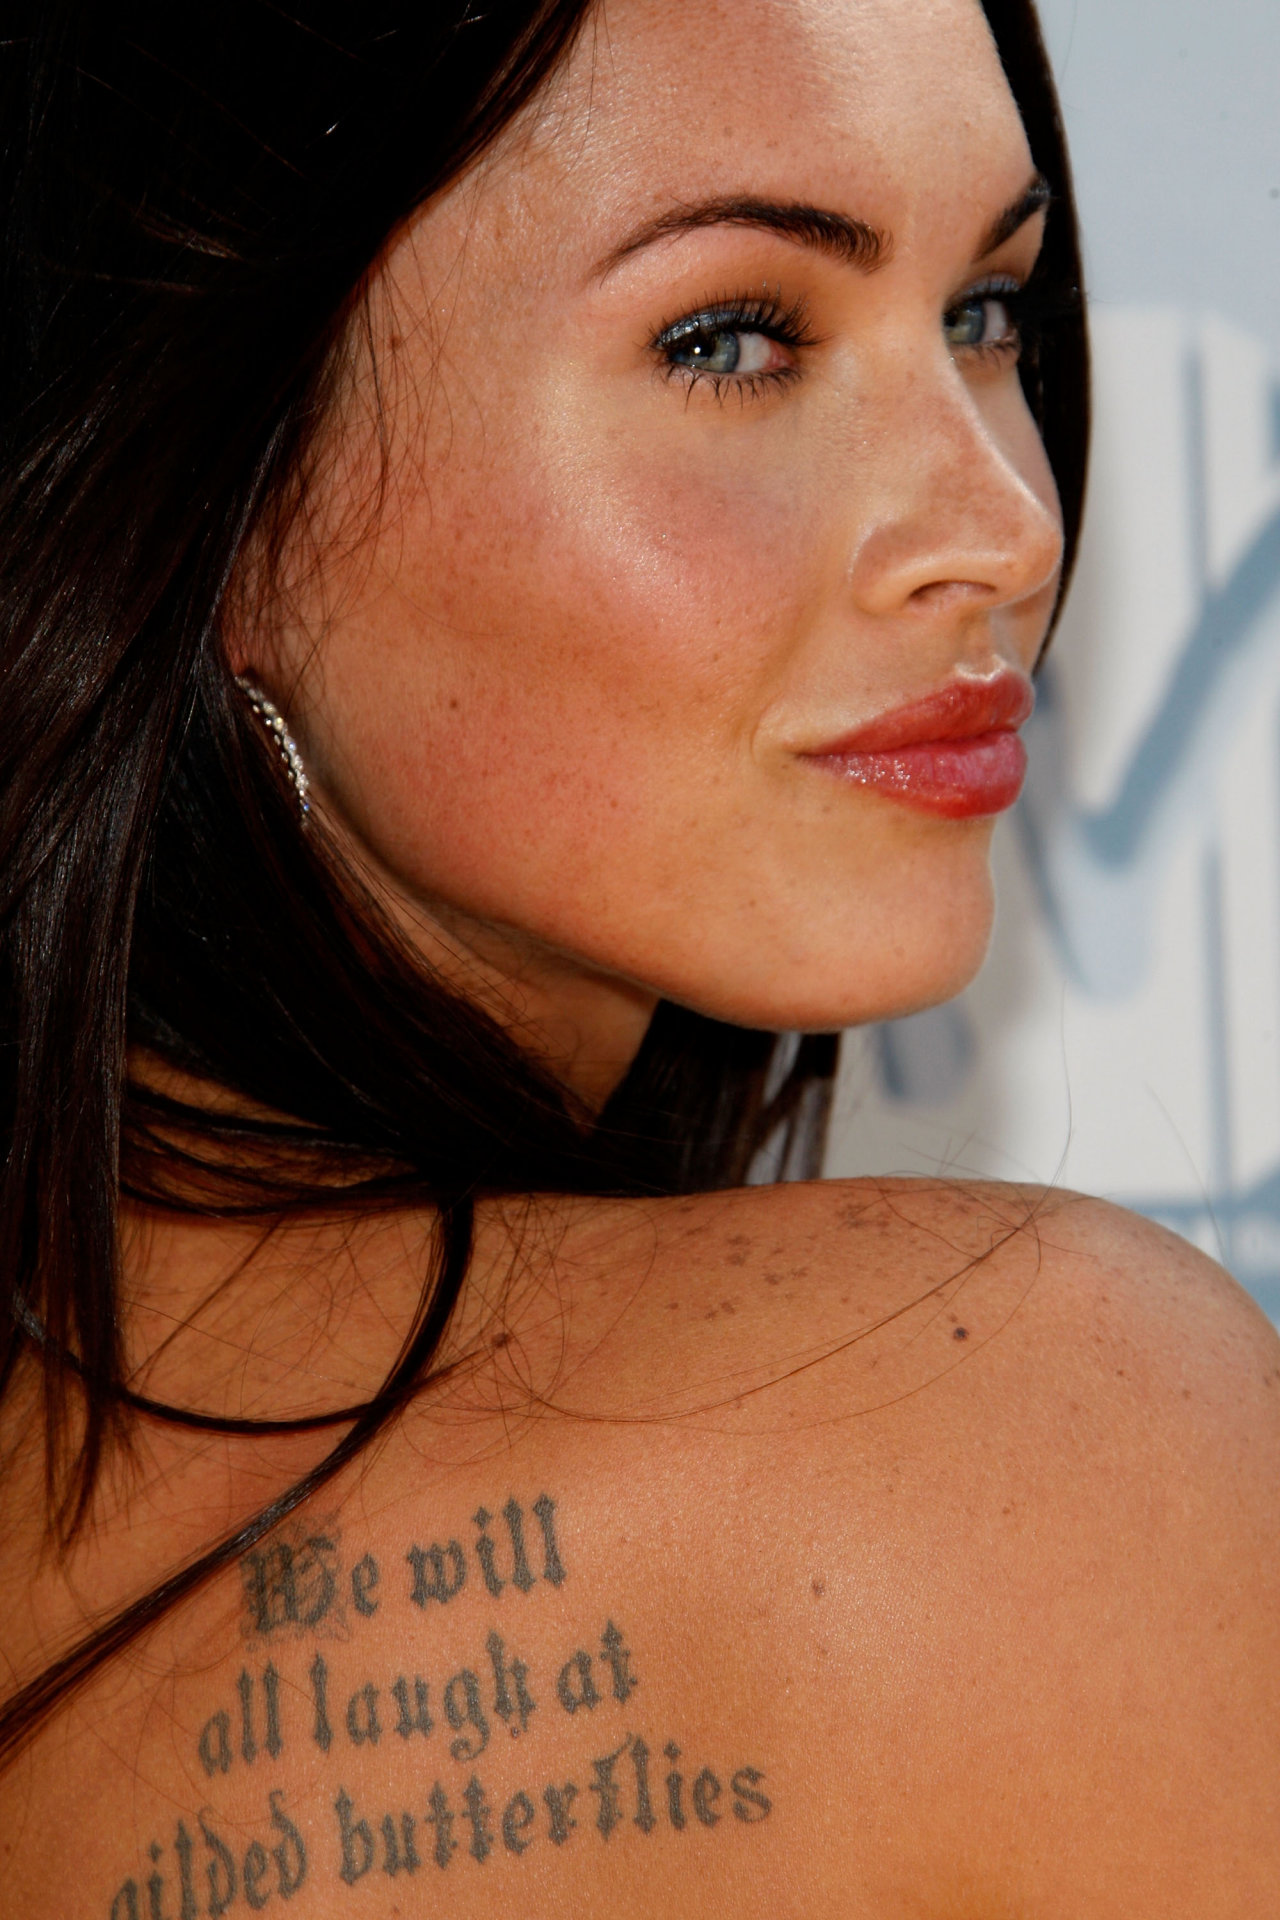 Megan Fox/მეგან ფოქსი E3778d0da26a91cb196c101449d1454a